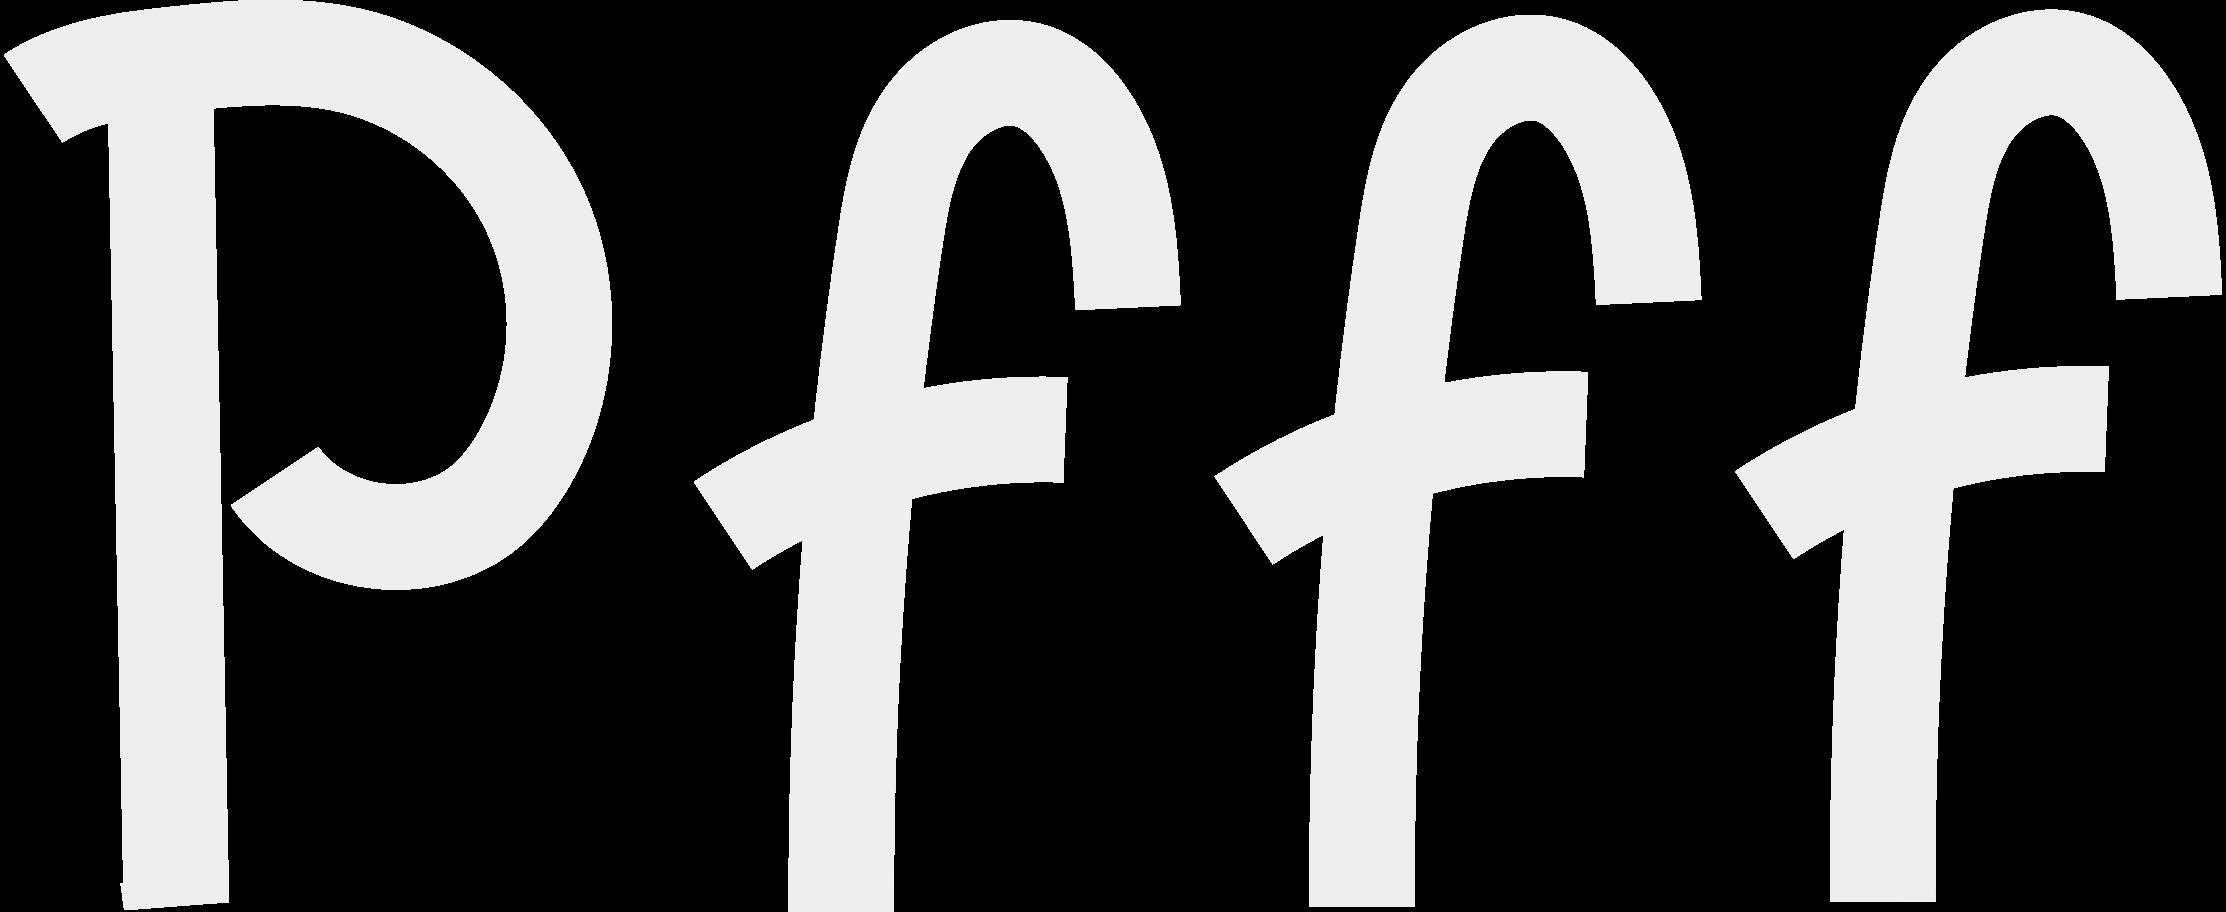 pfff Clipart illustration in PNG, SVG